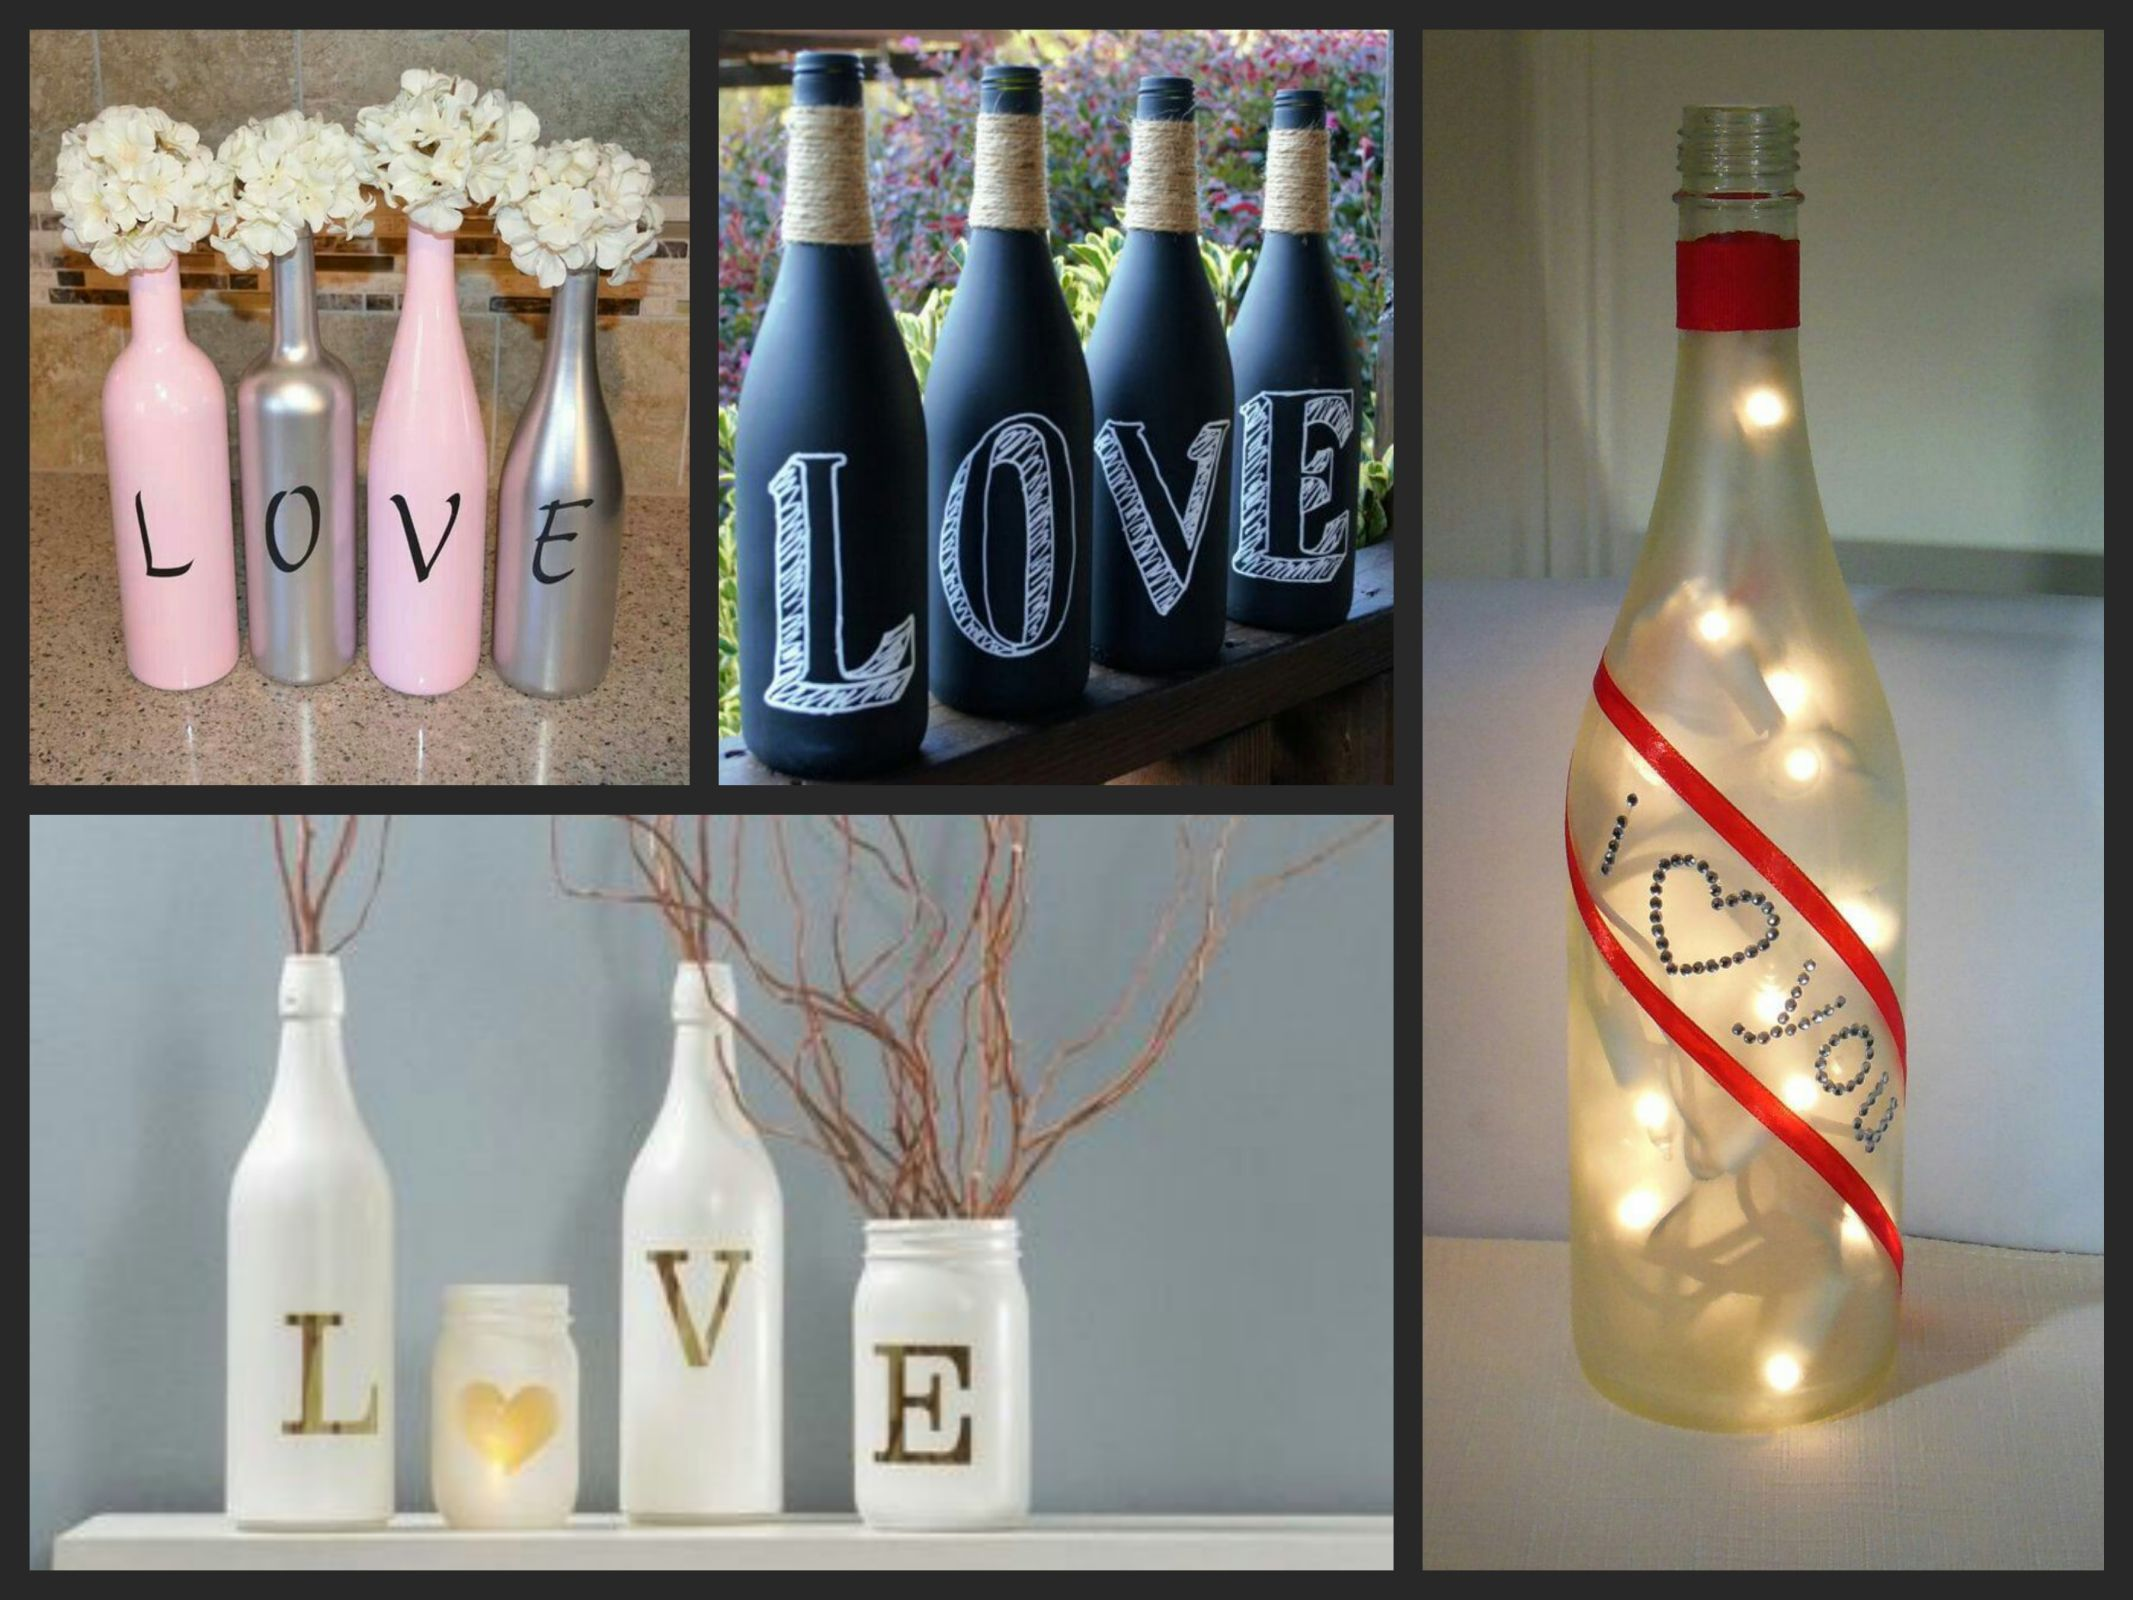 Bottle decorating ideas, glass bottle crafts ideas, Best